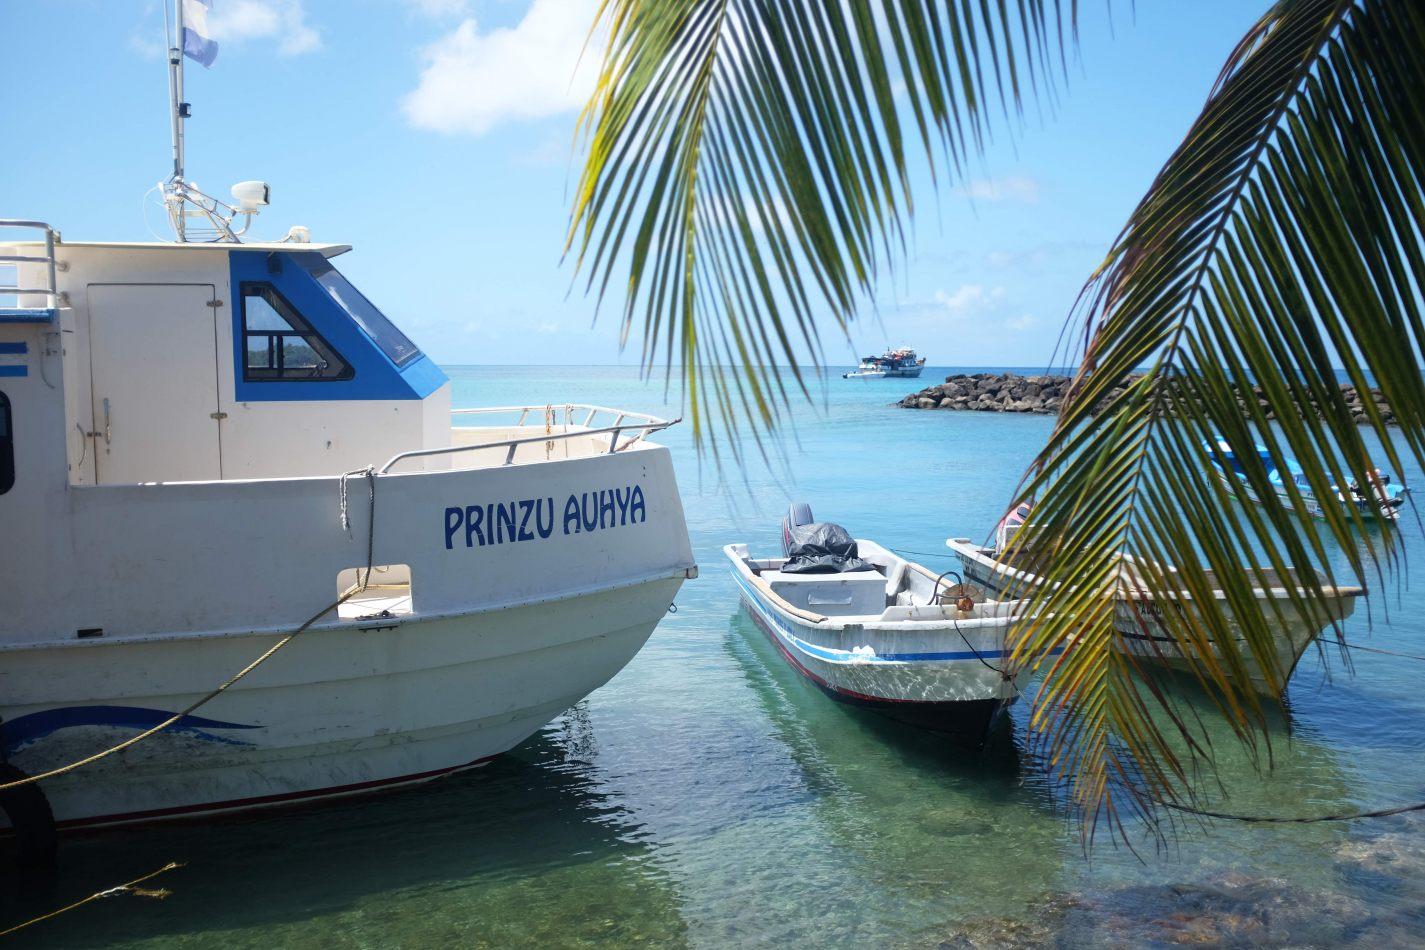 Hibiscus & Nomada : Corn Islands - Big Corn Island, Ferry Dock